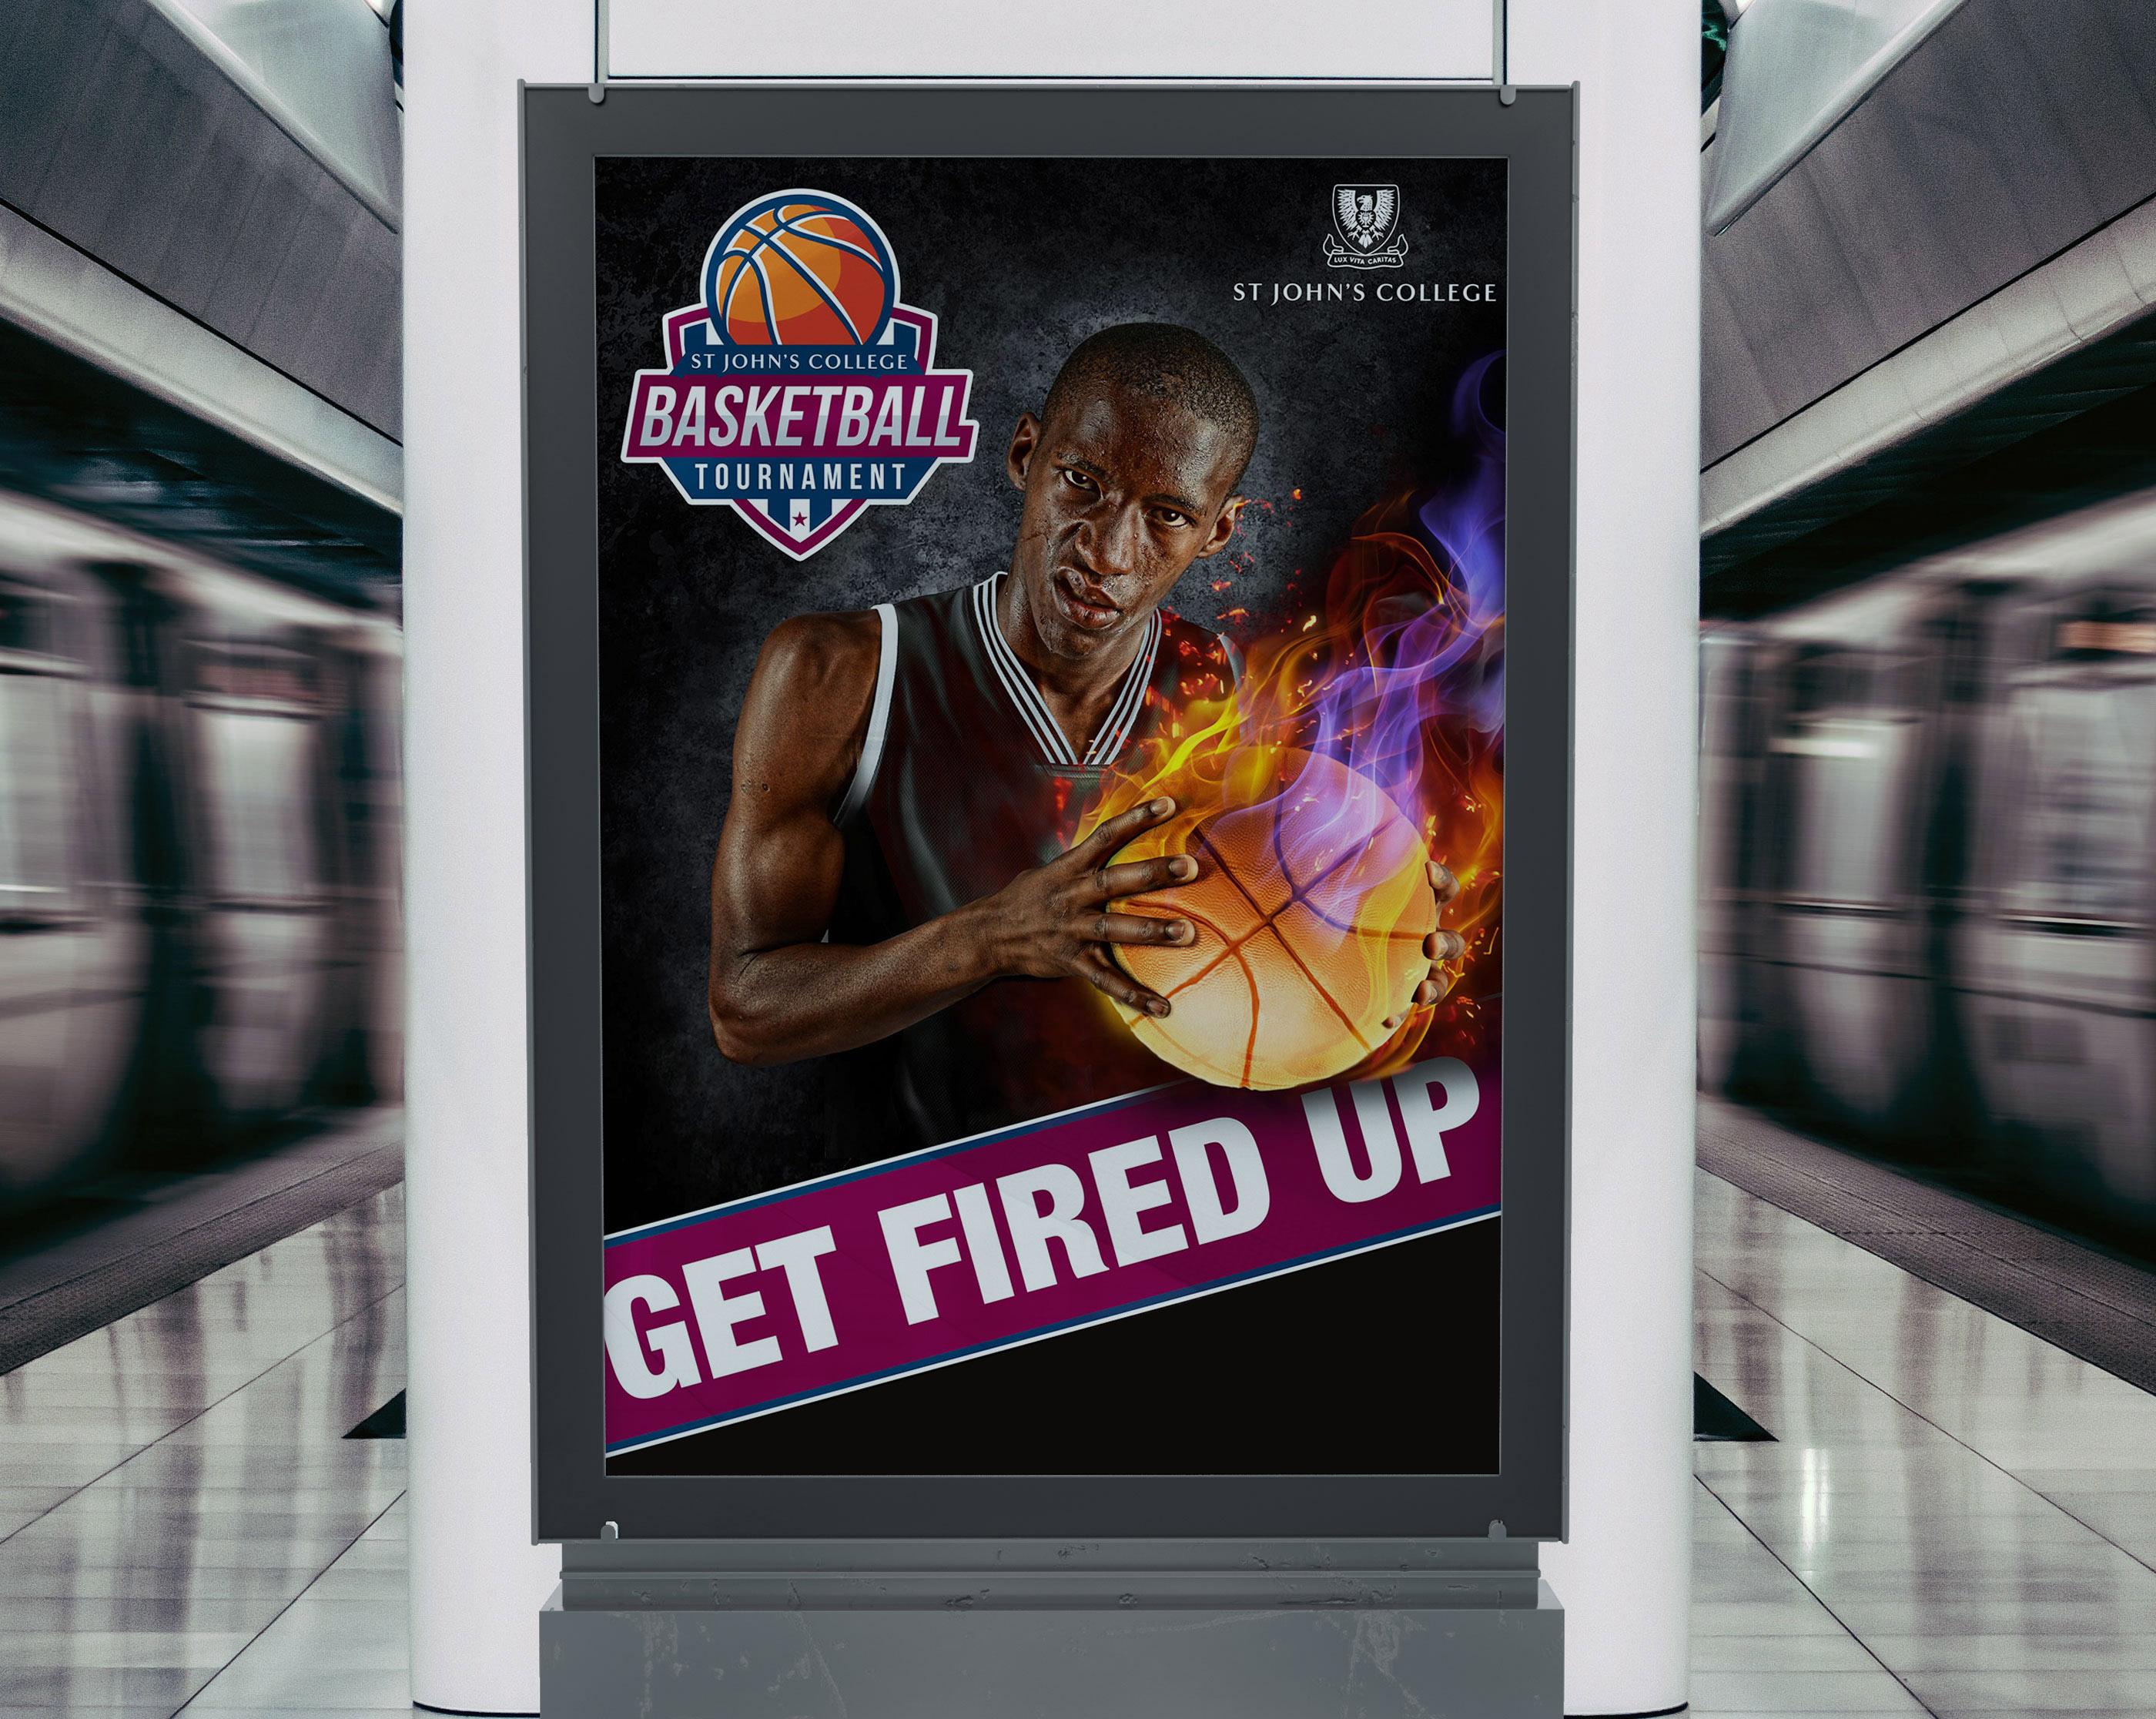 graphic-design-st-johns-basketball-tournament-poster-design-by-agent-orange-design-2020.jpg